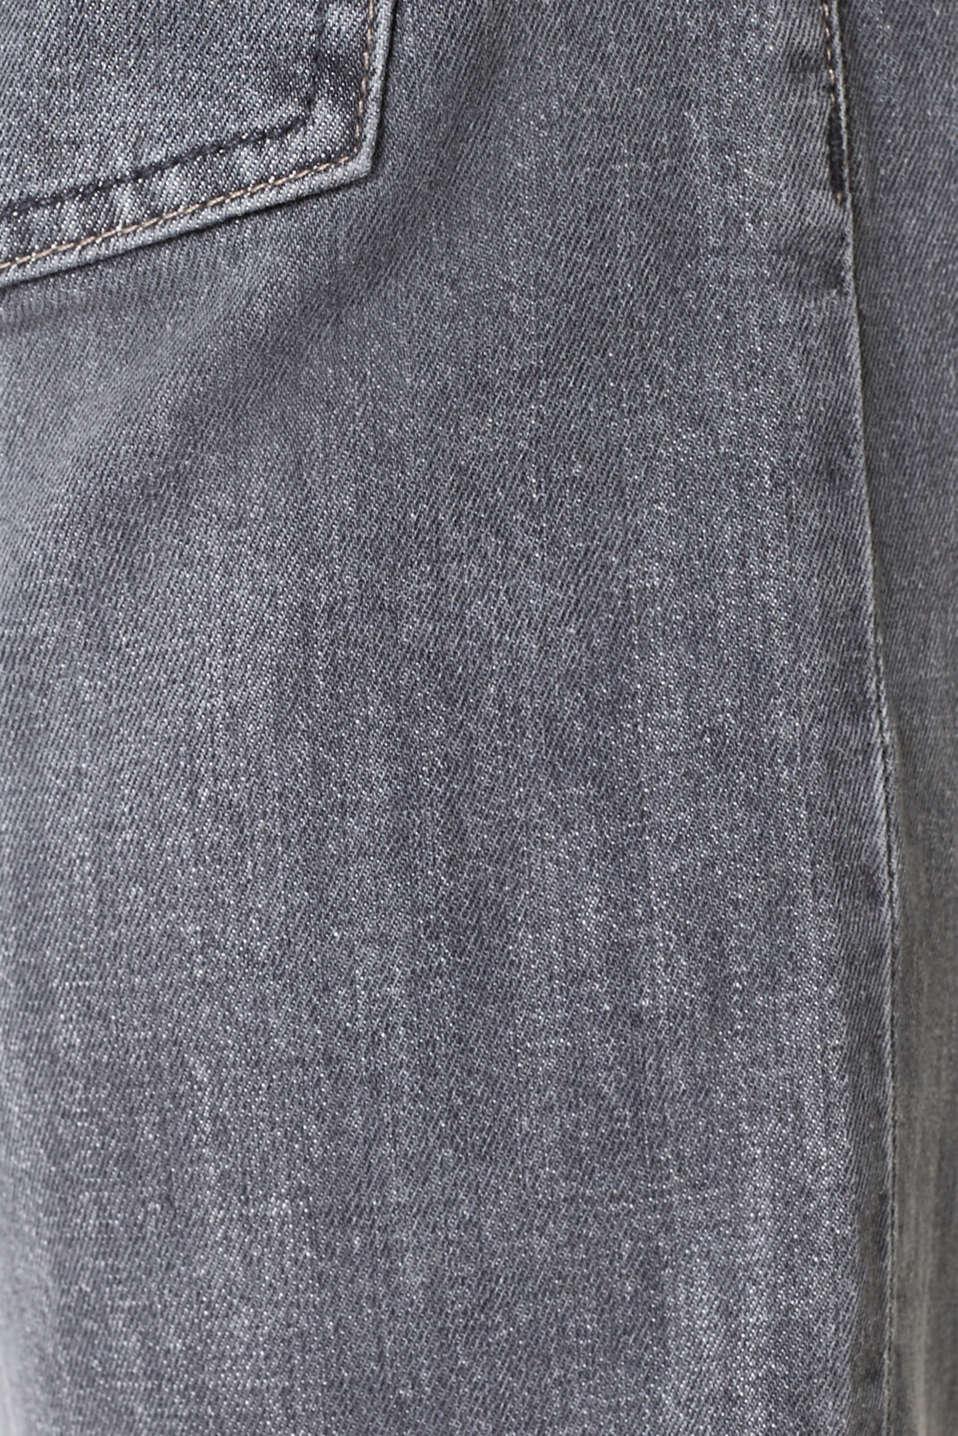 Pants denim, GREY MEDIUM WASH, detail image number 5